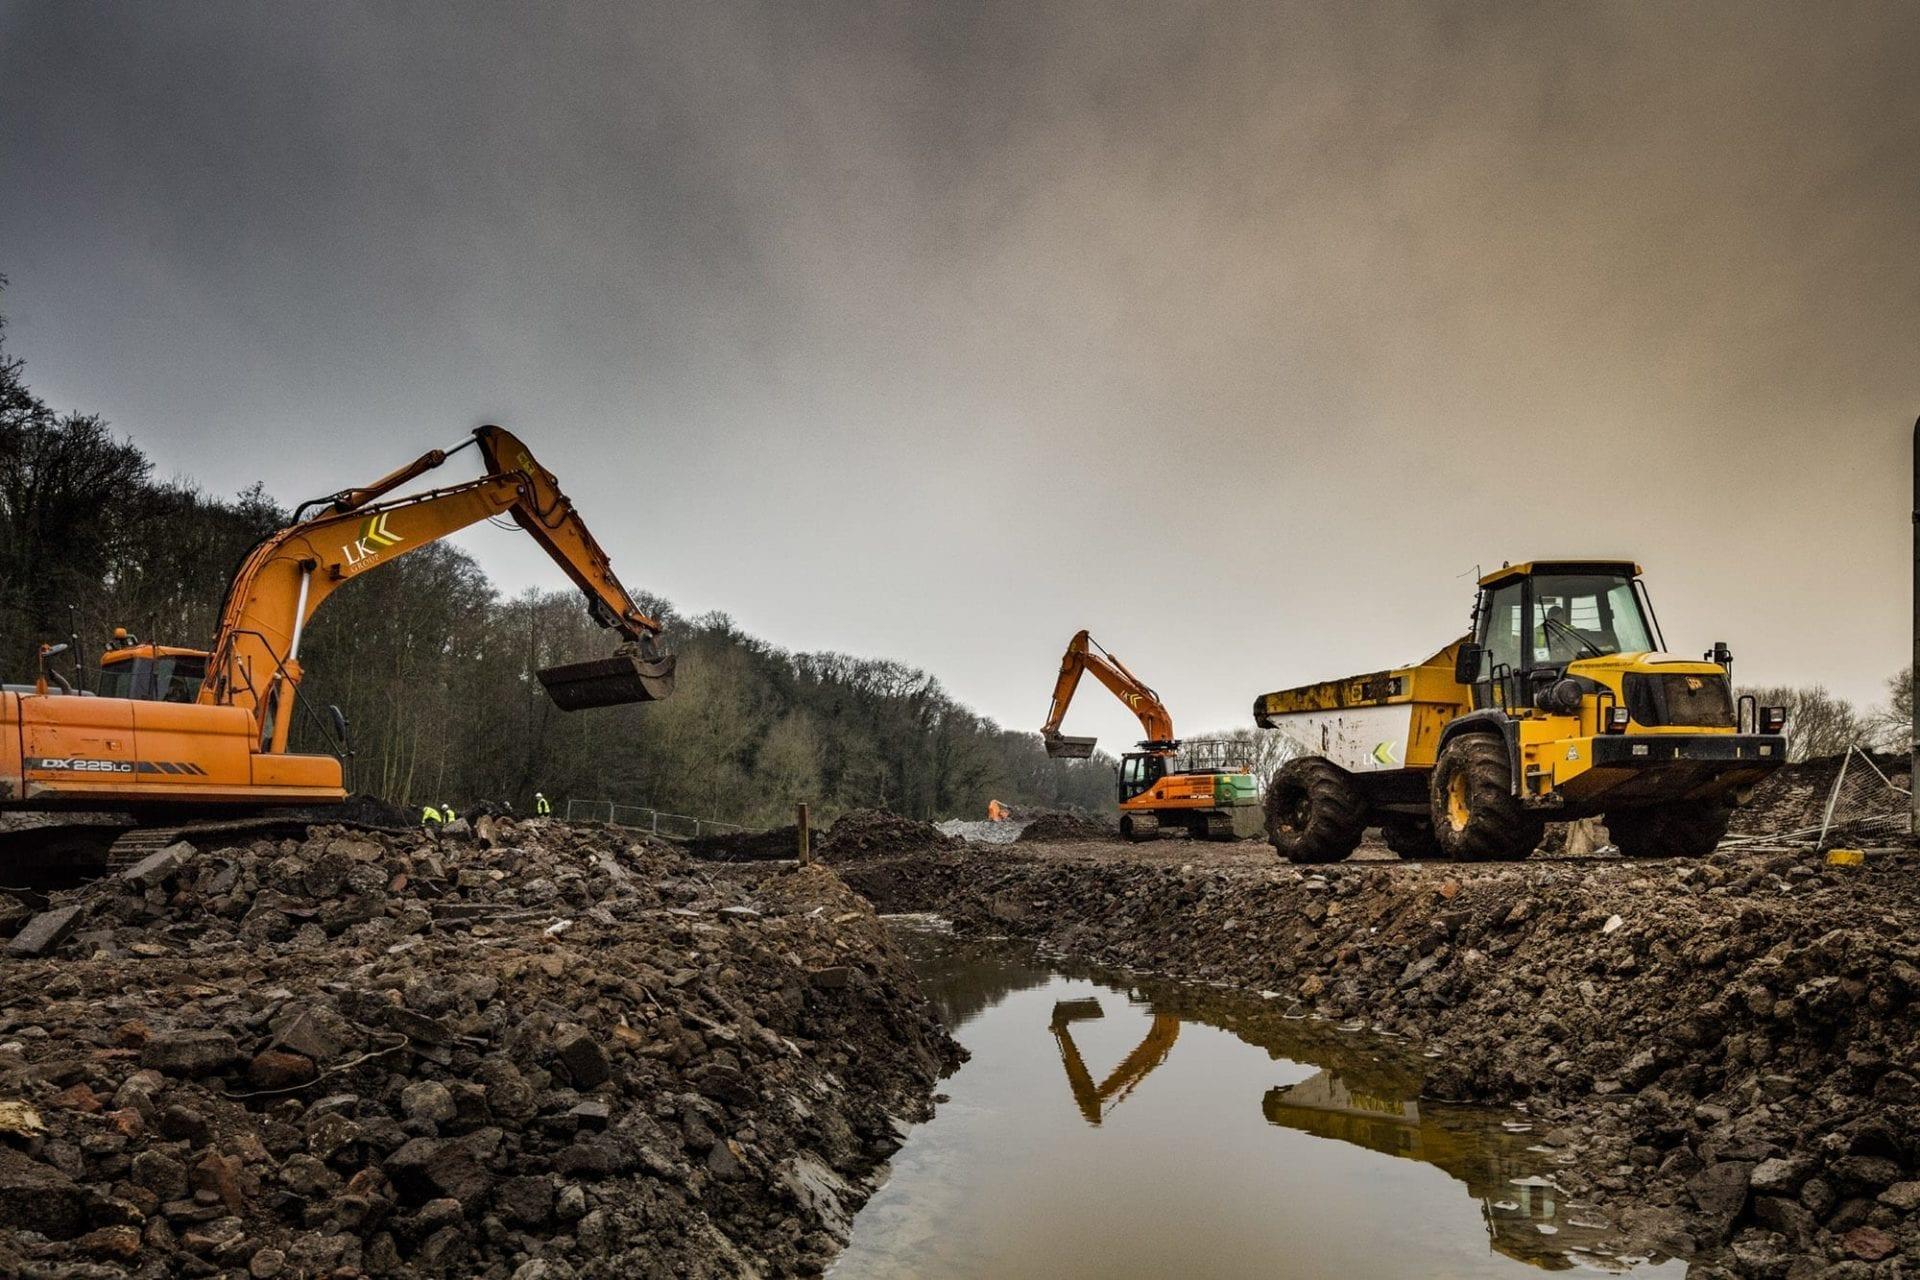 LK Land Remediation